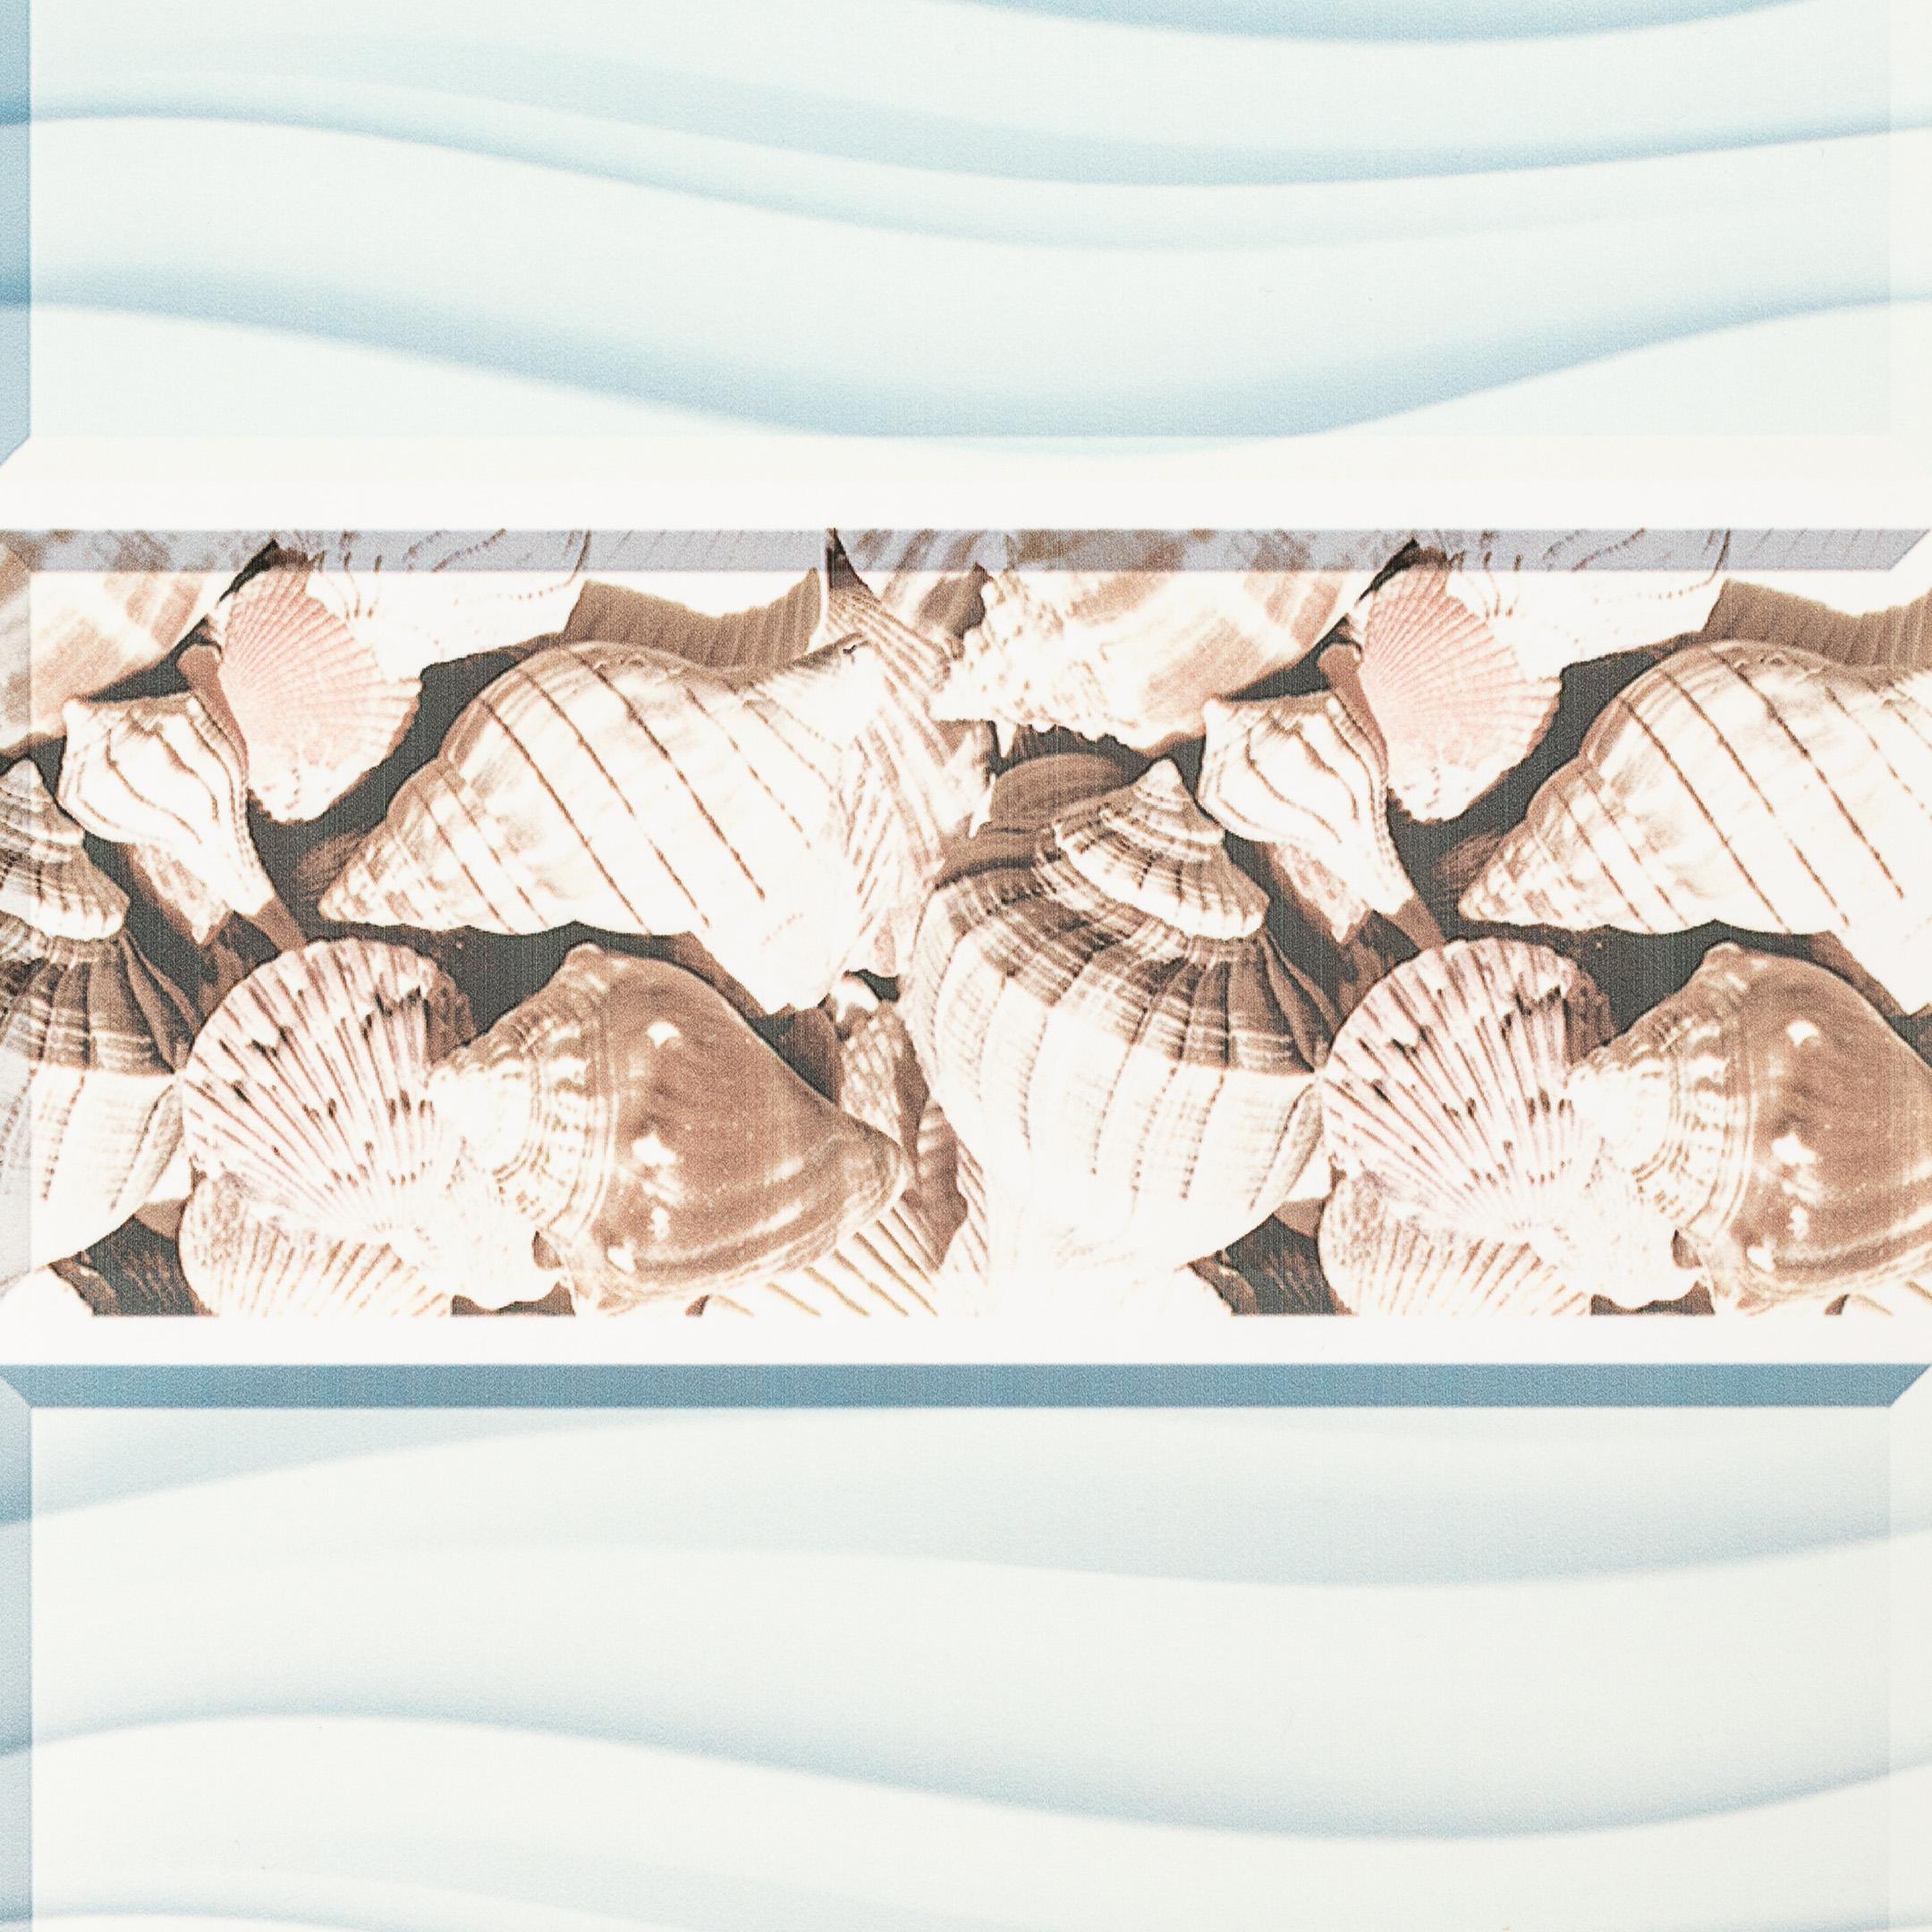 Панель ПВХ 250х2700х8 мм Центурион Blossom ракушки фон.